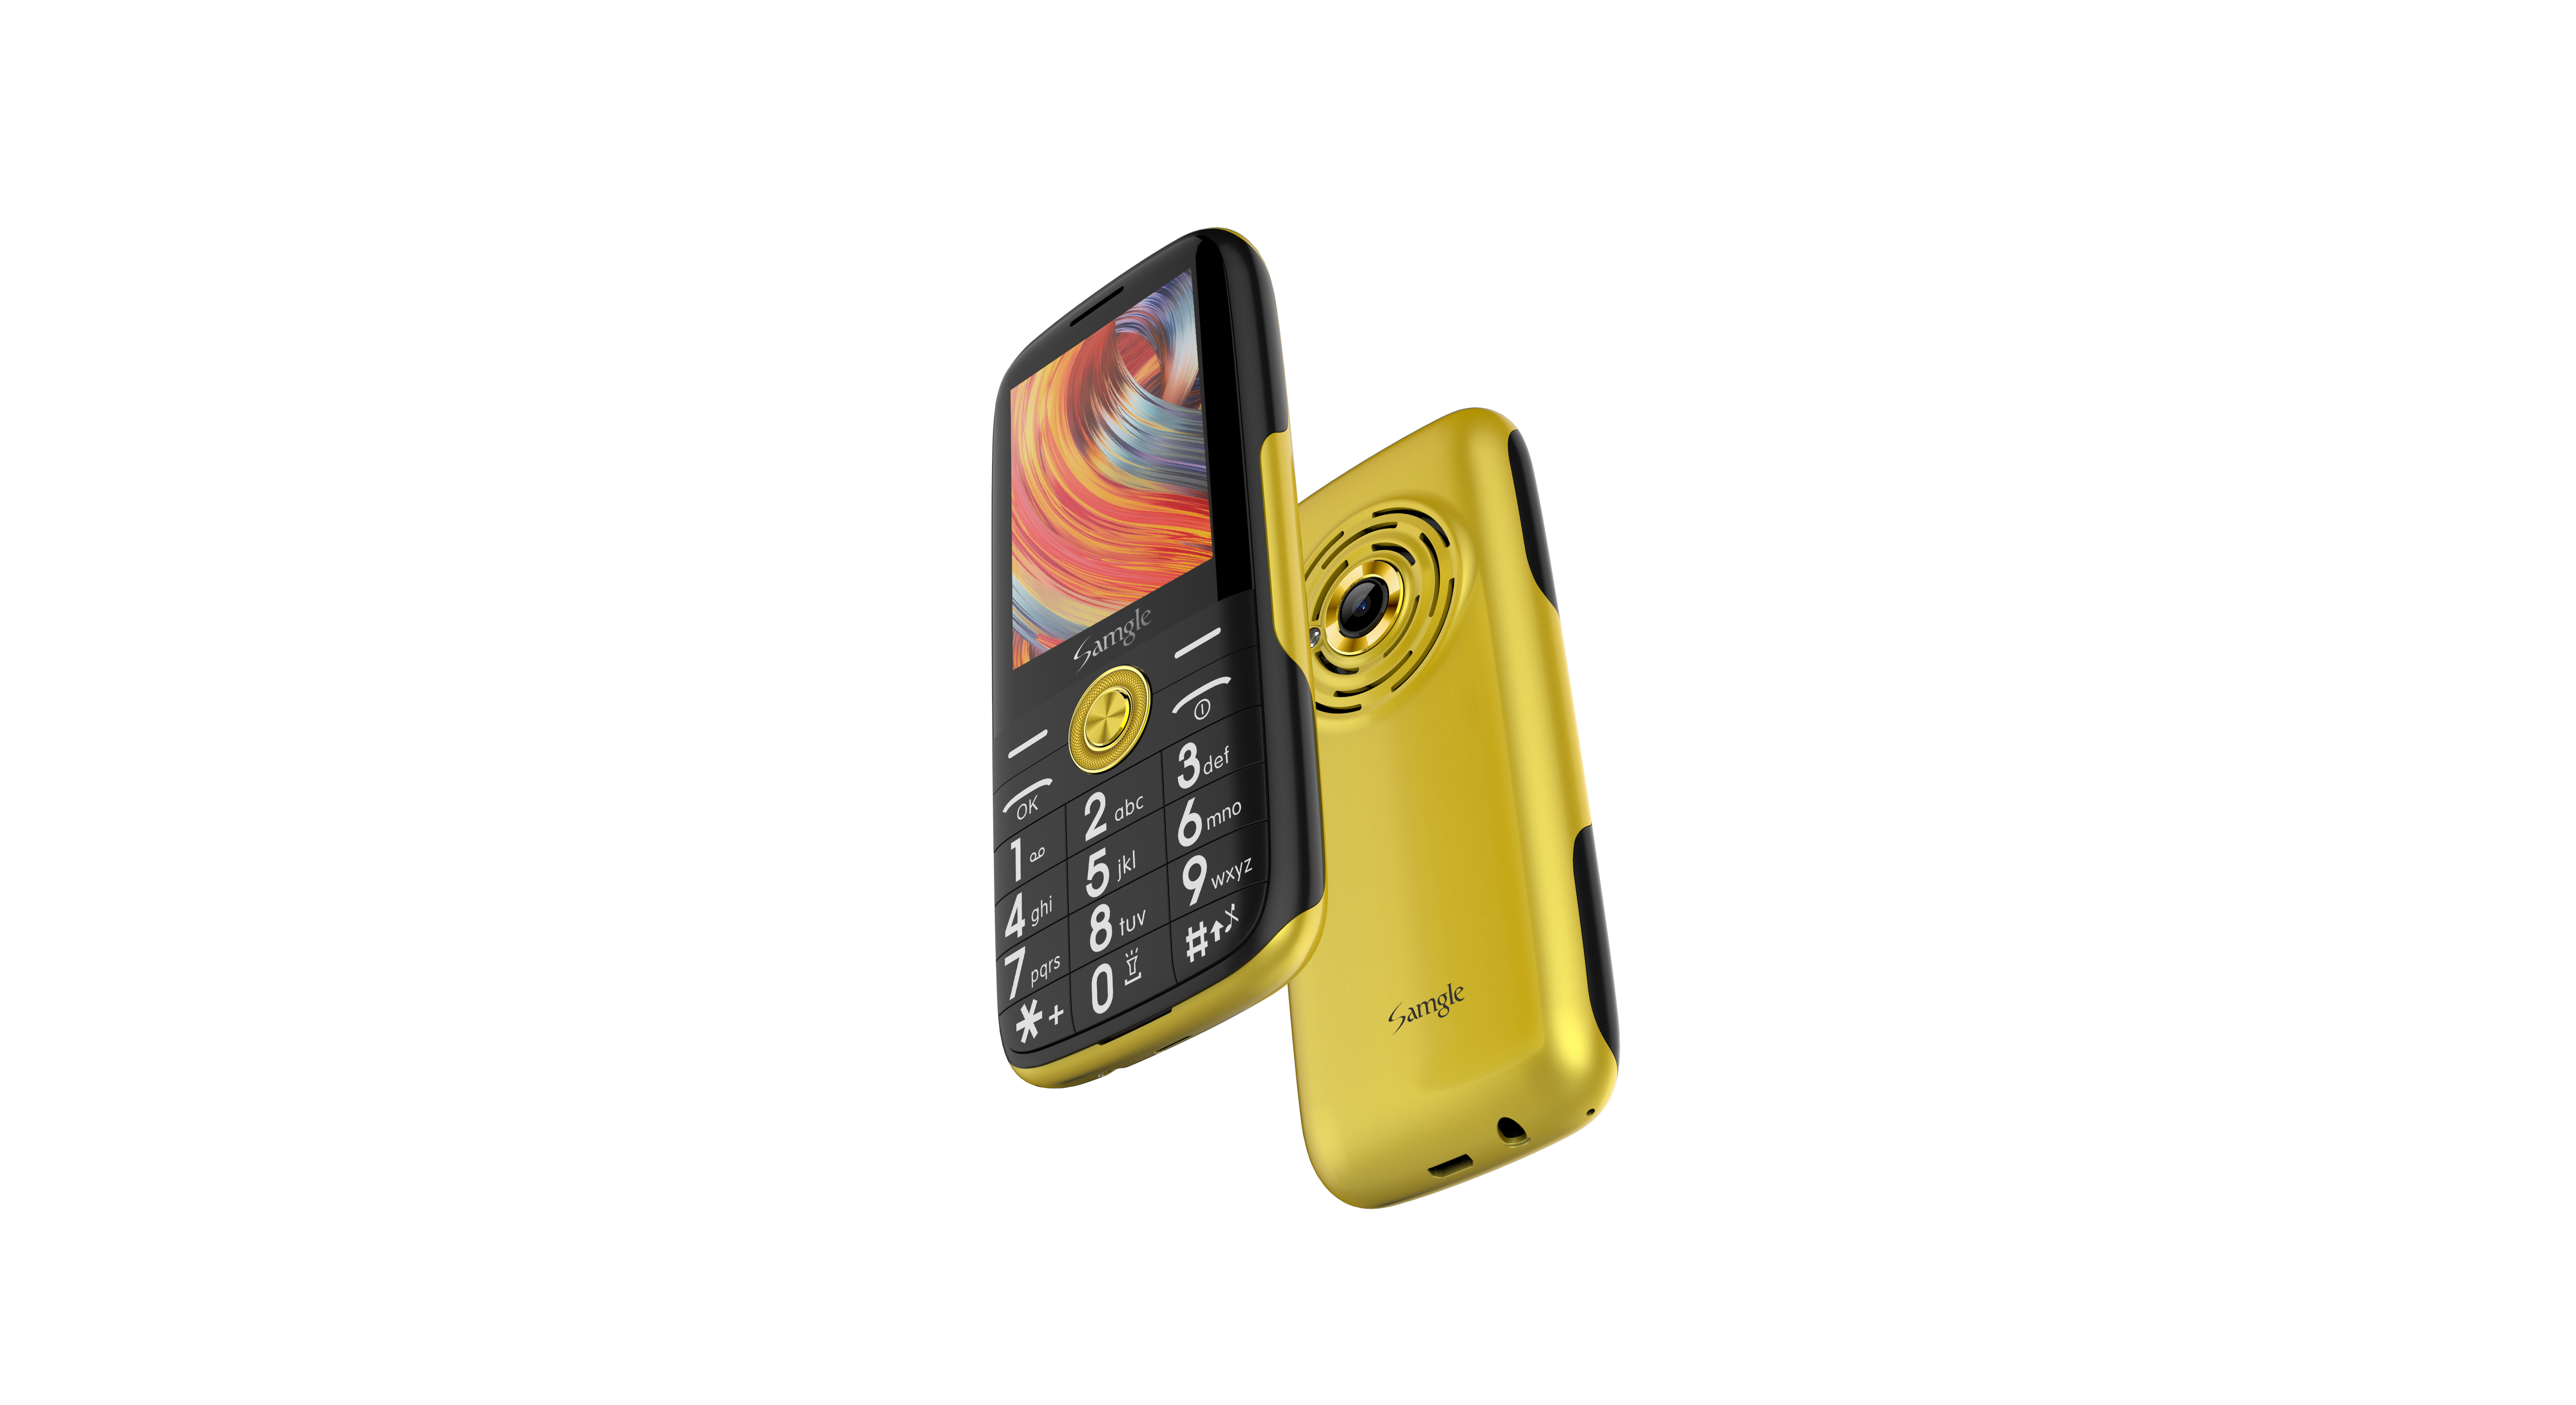 Telefon mobil Samgle Captain 3G, QVGA 2.4 inch, Bluetooth, Digi 3G, Camera, Slot Card, Radio FM, Internet, Dual SIM17